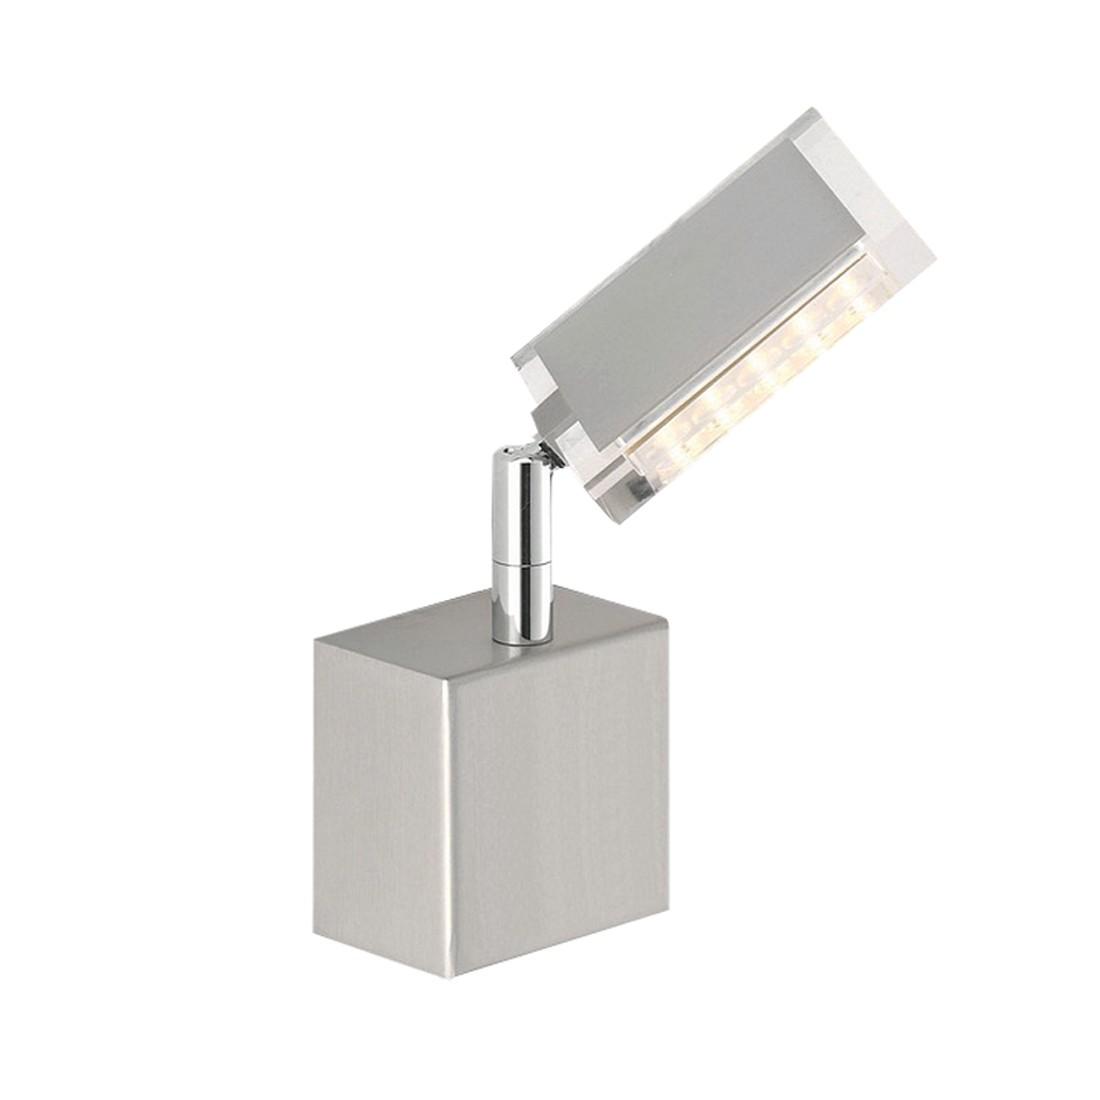 Wandleuchte LED FUTURA - Stahl, Paul Neuhaus